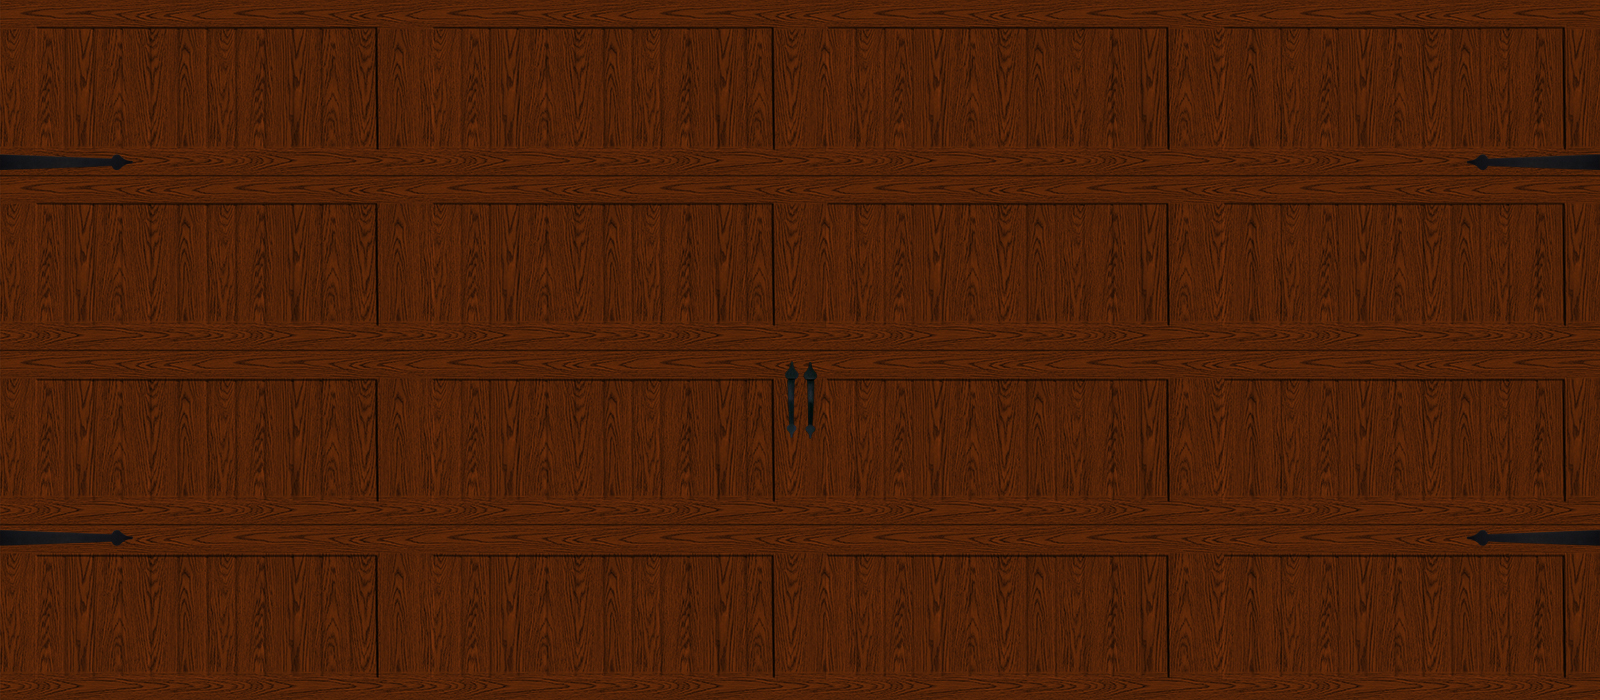 16x7 Long Panel Carriage Light Oak - hardware